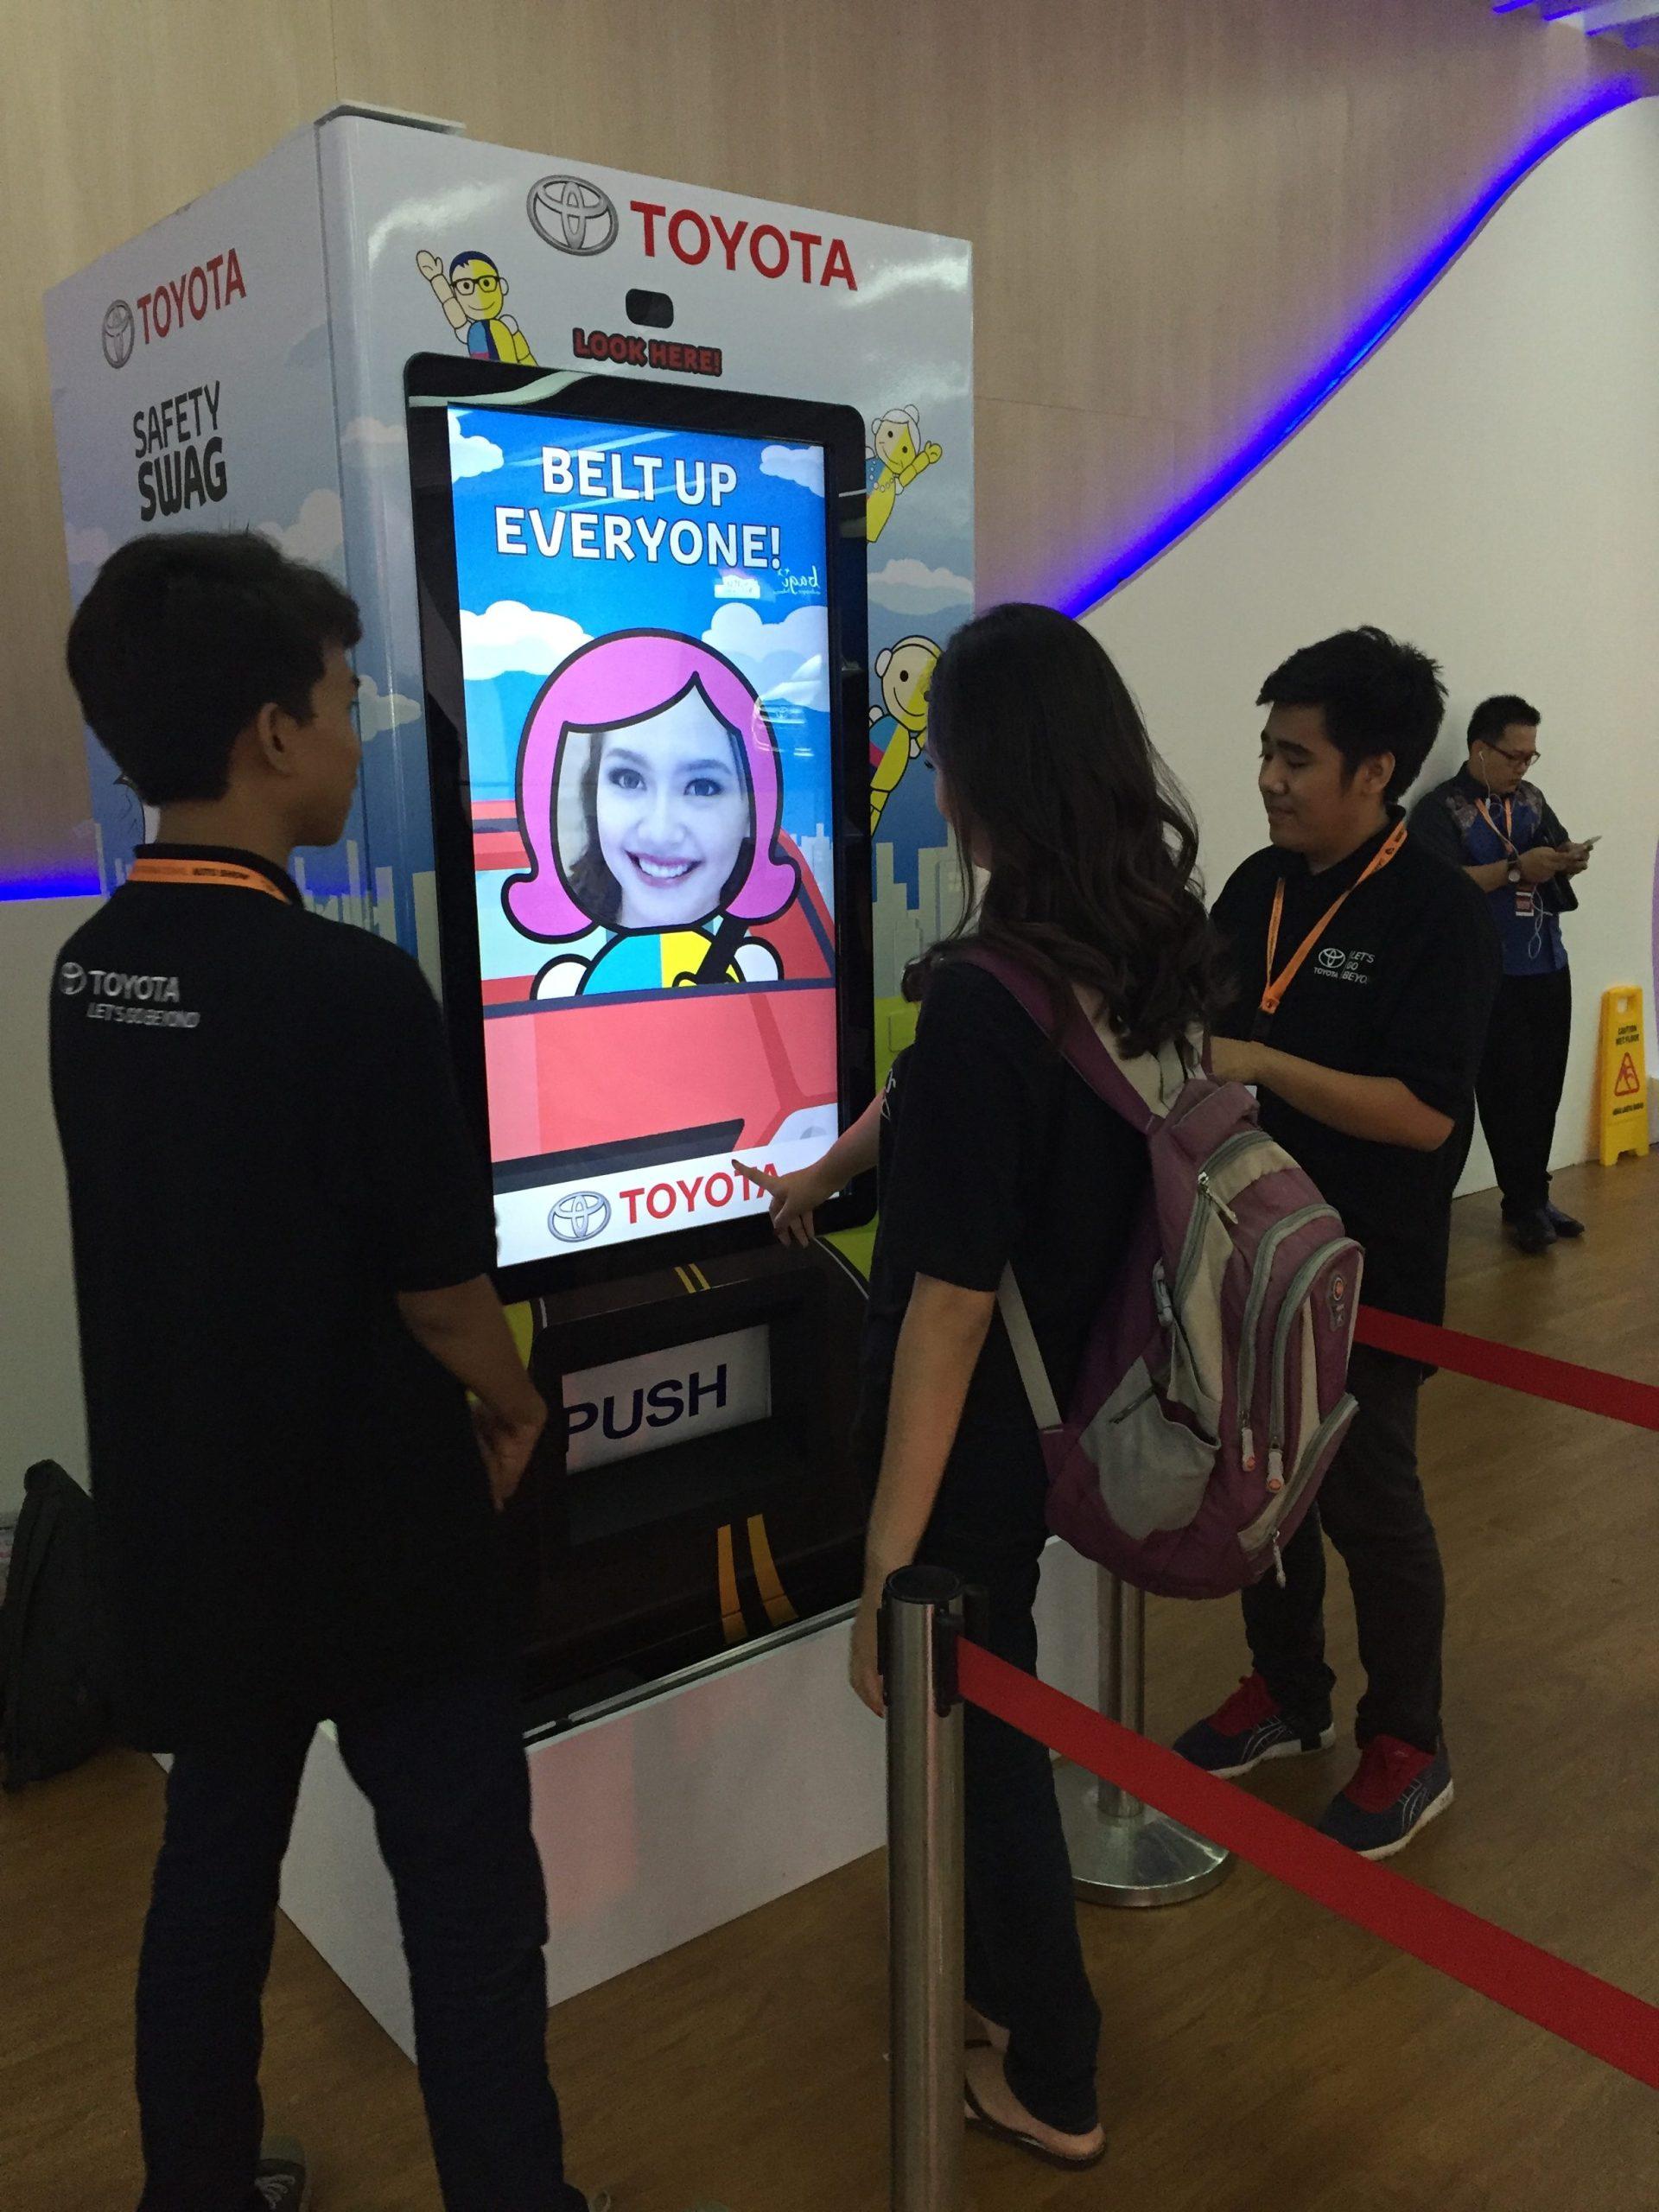 Toyota Vending Machine interativa